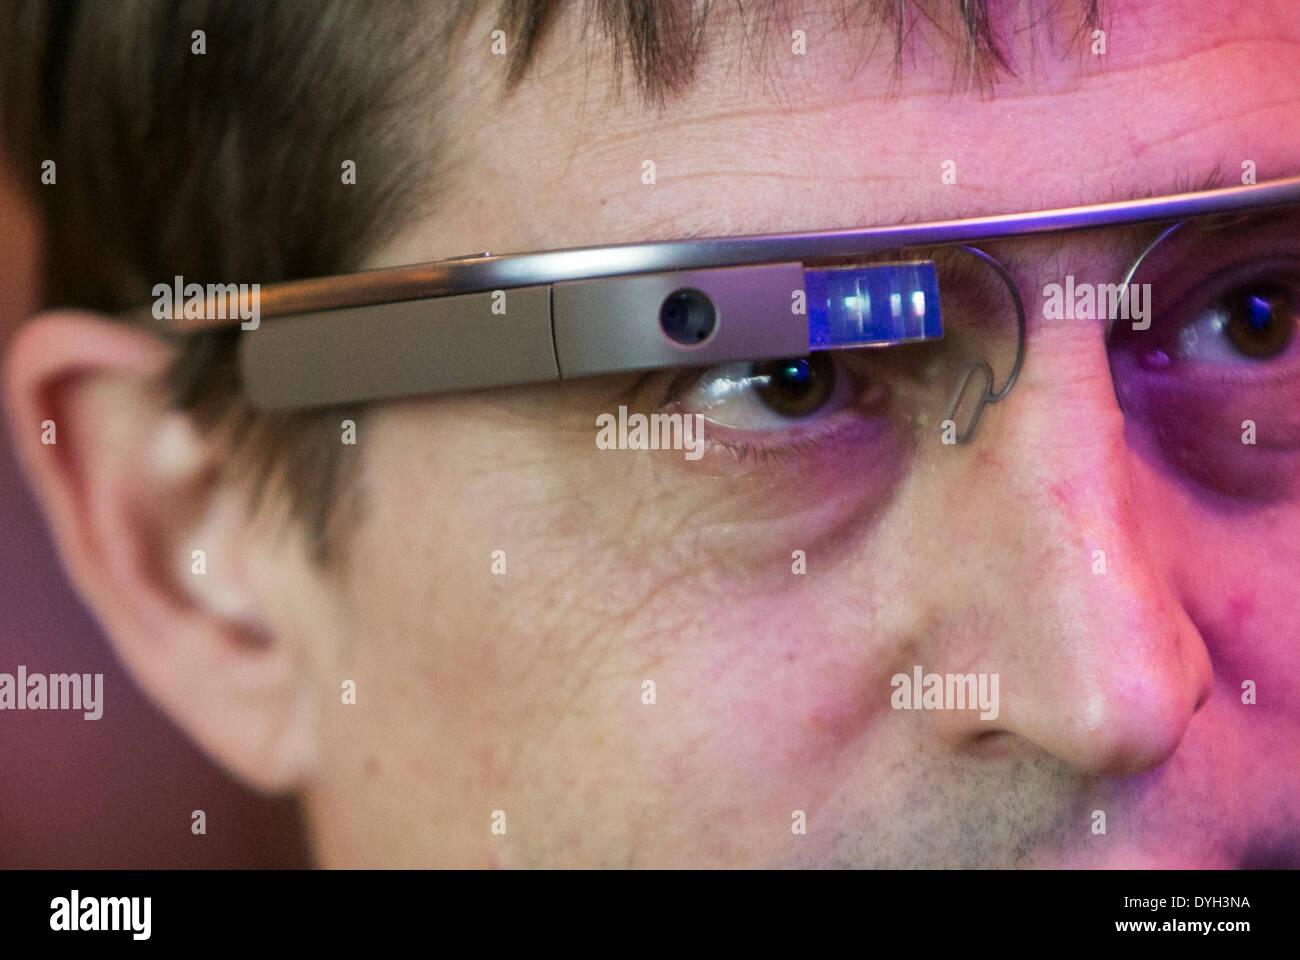 Washington DC, USA . 17th Apr, 2014. An individual wearing Google Glass attends an Economic Club of Washington event Stock Photo